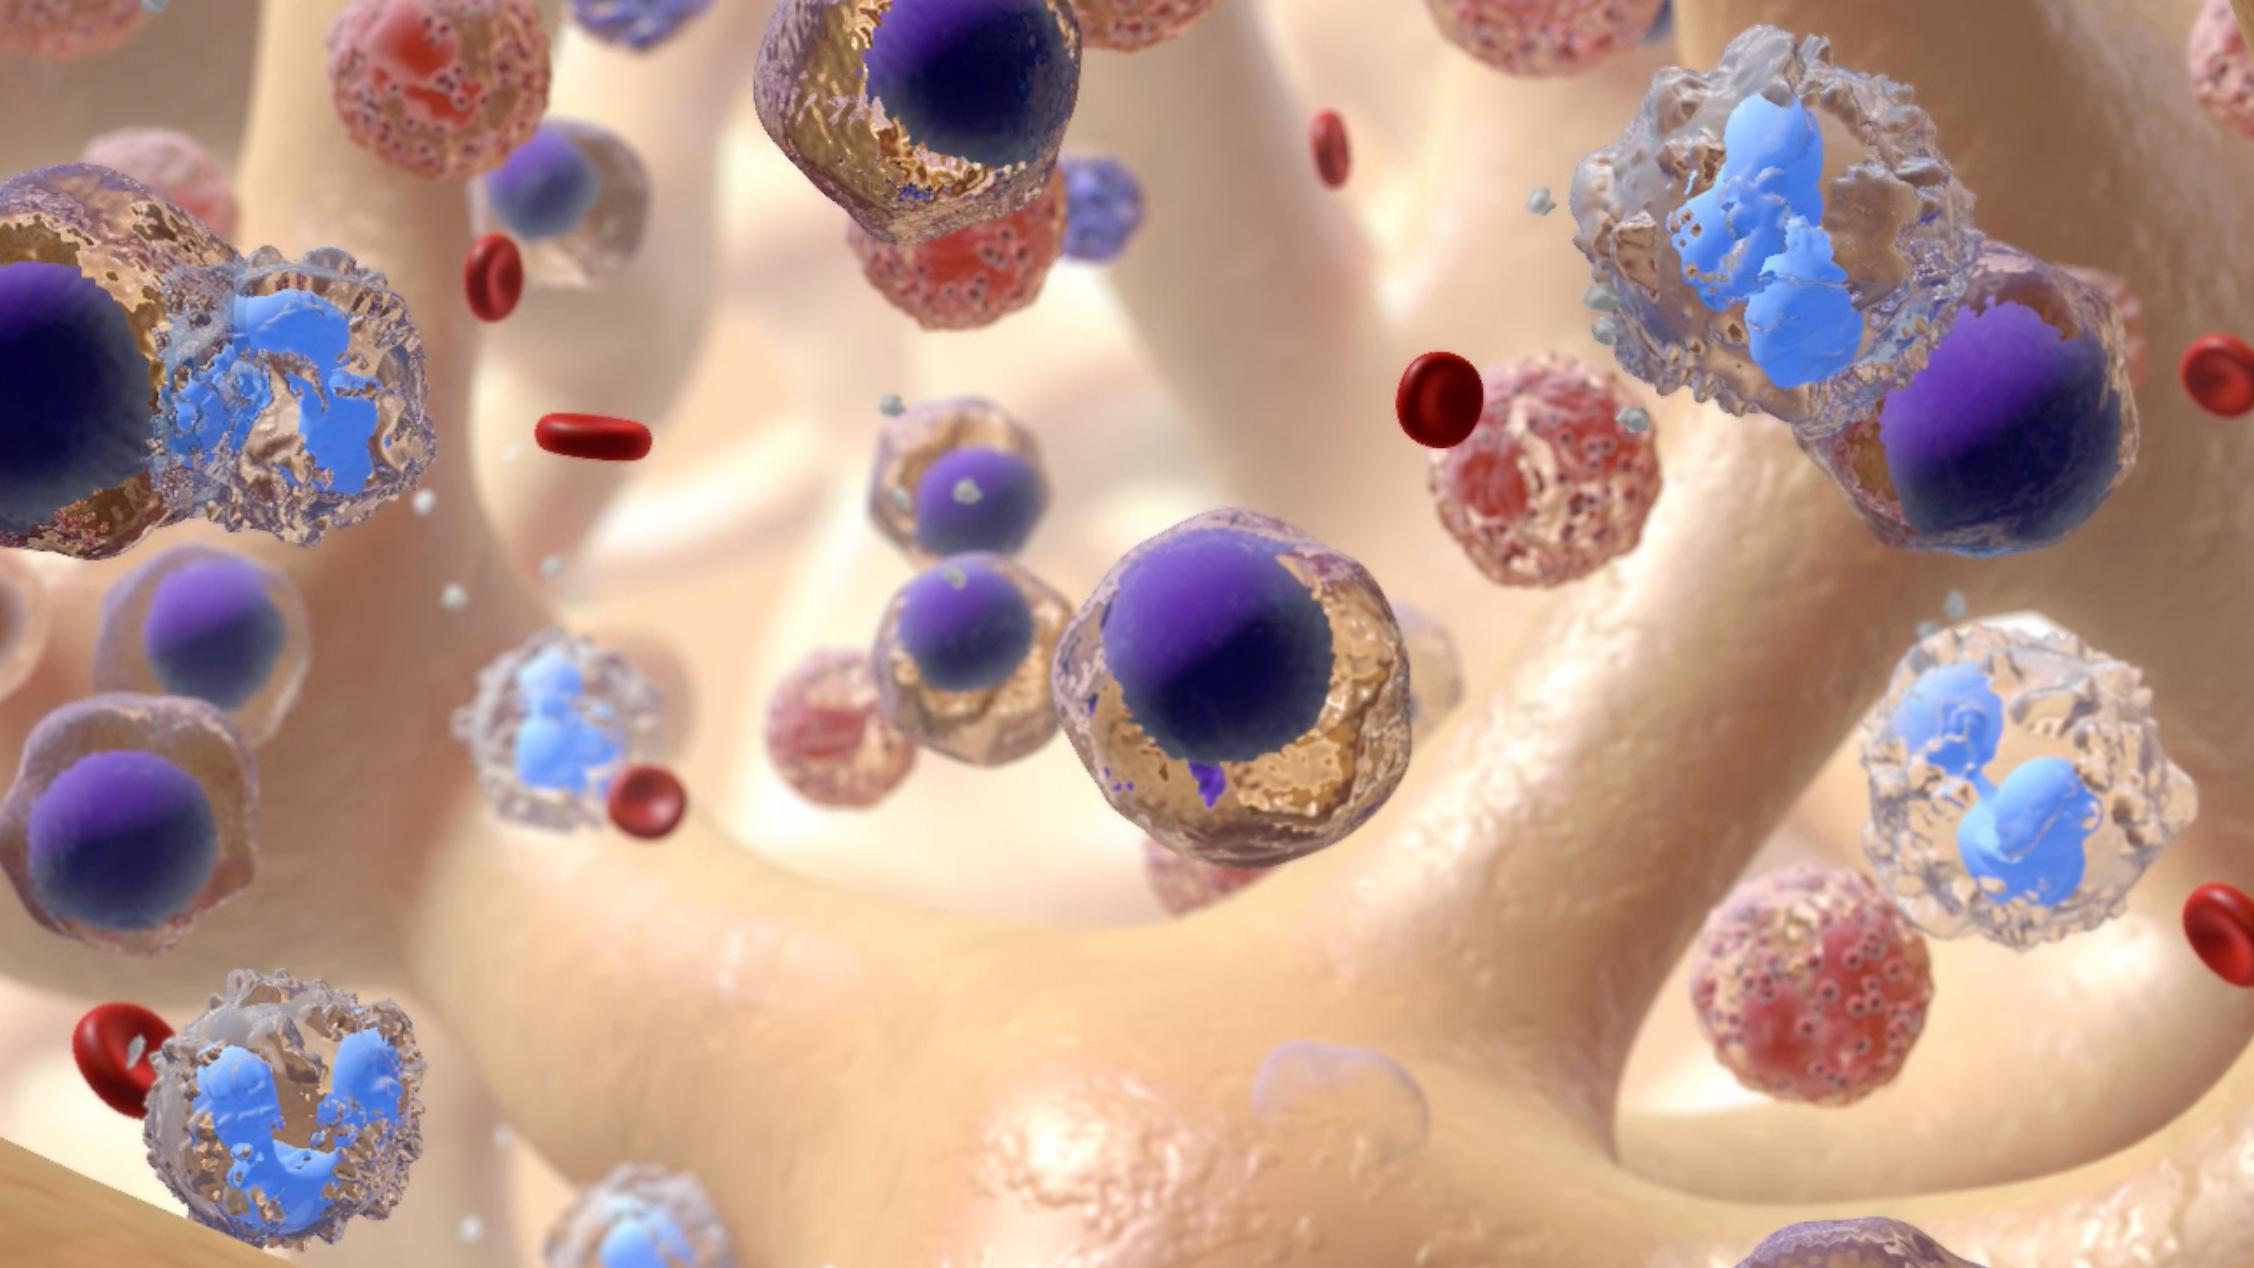 Treatment Options for Leukemia